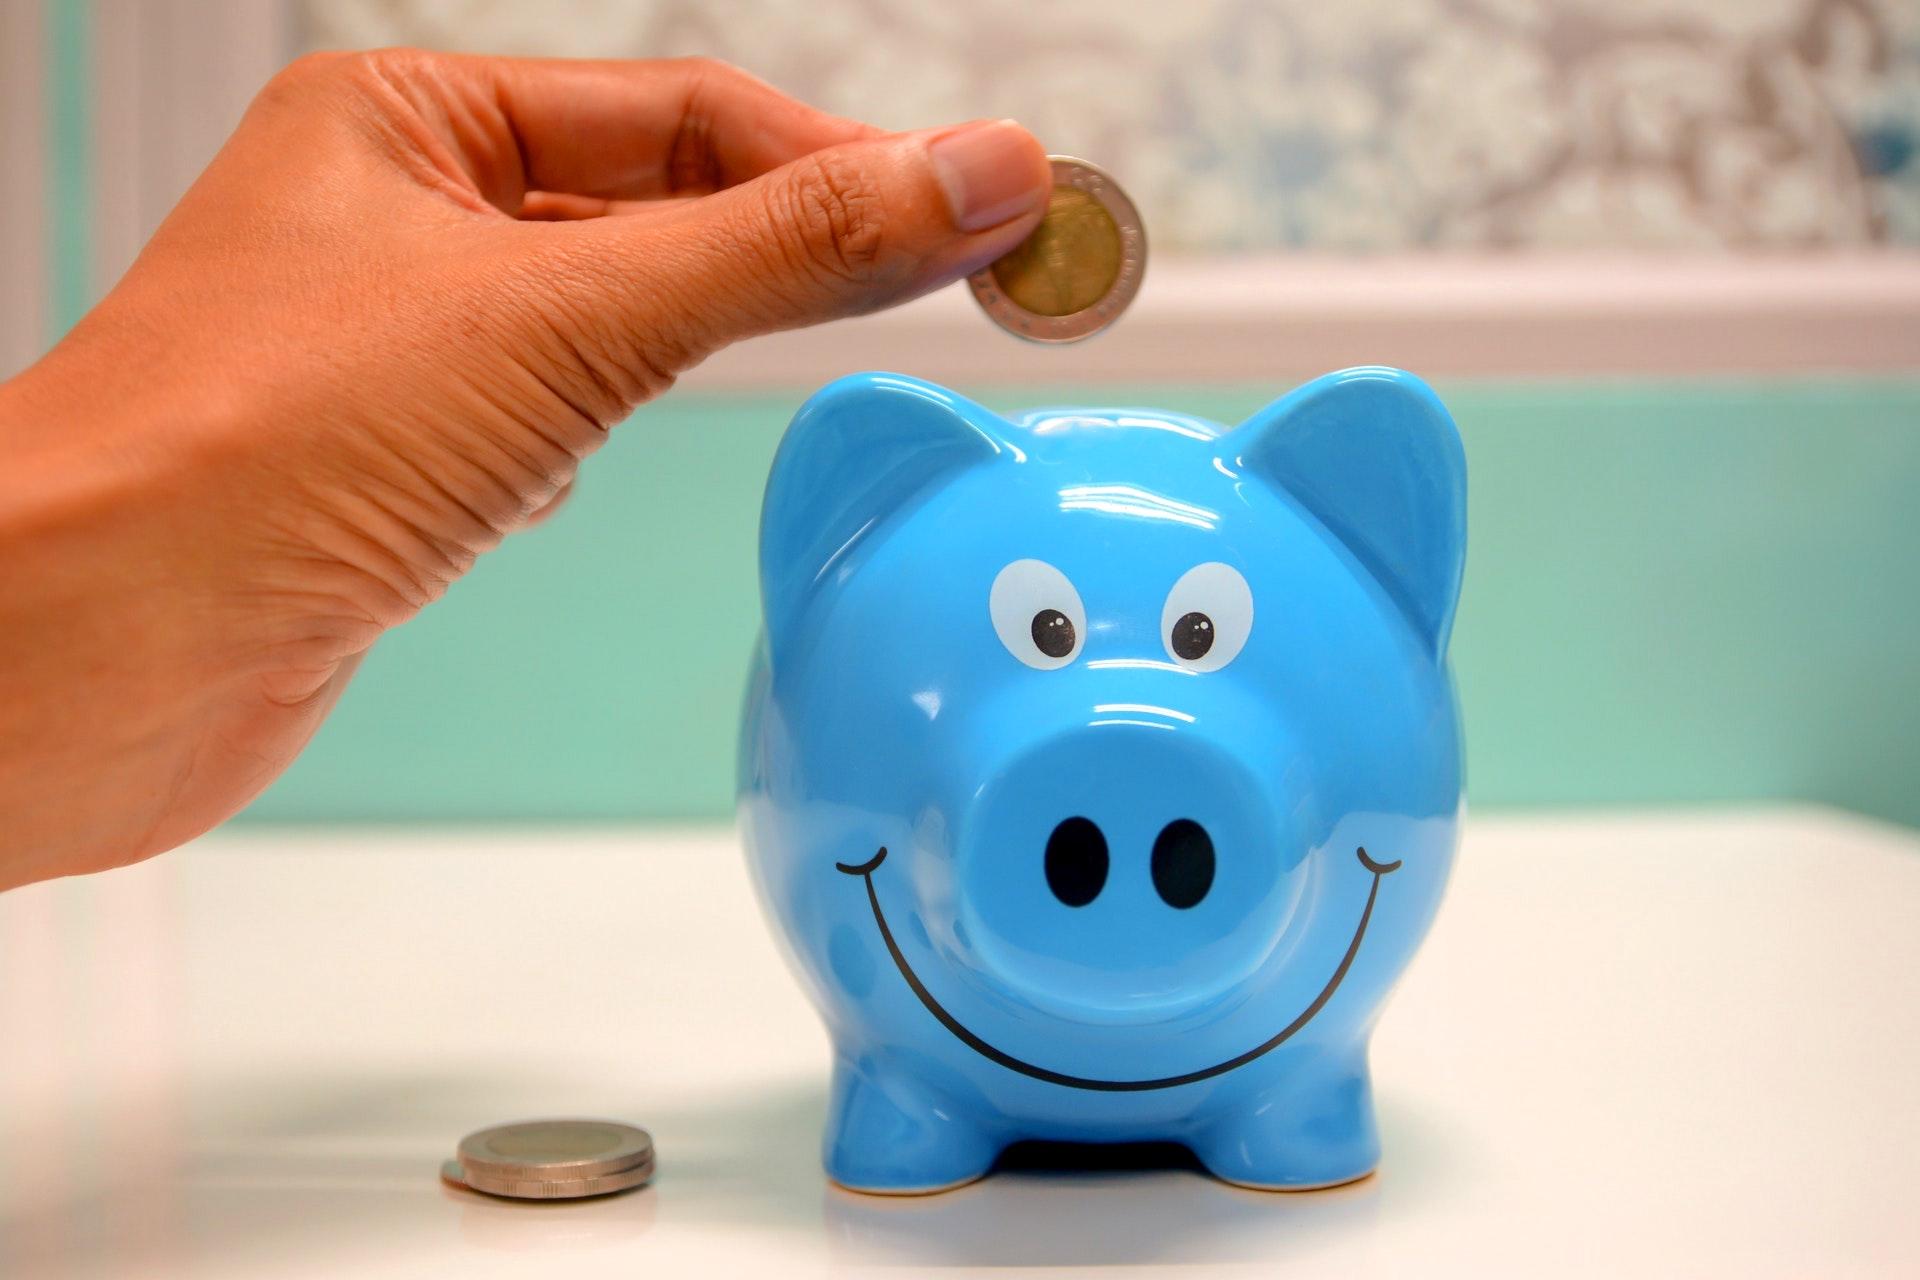 affordable saving at the dentist's